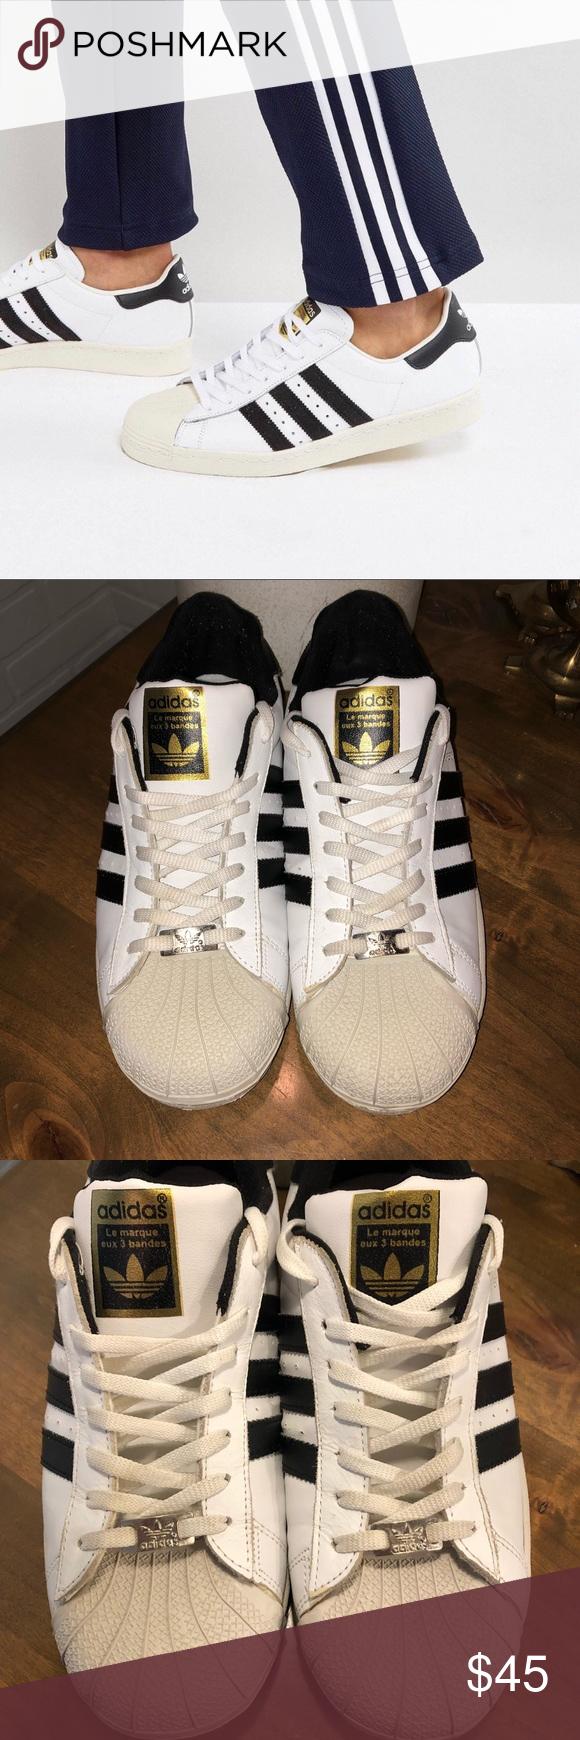 Classic Adidas Original Superstar Sneakers   Adidas originals ...